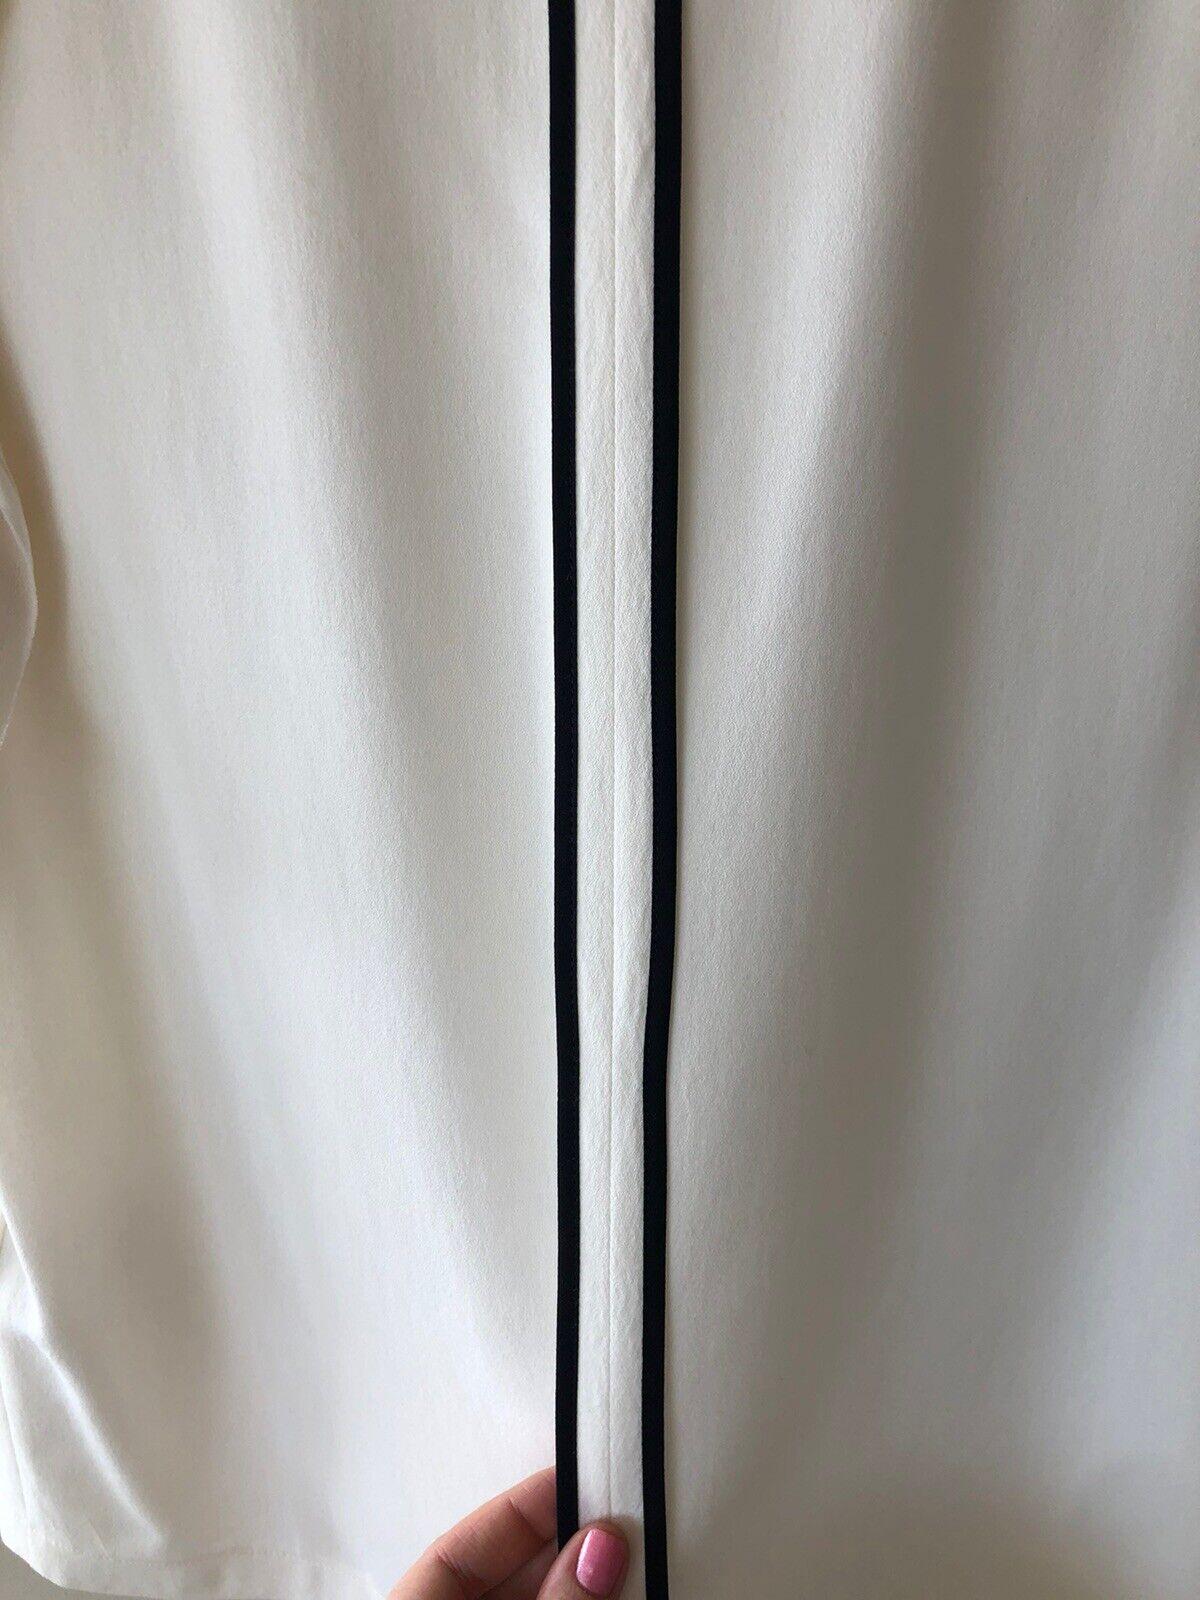 FENDI Silk Ruffle White Ivory Top Blouse SZ 44 - image 10